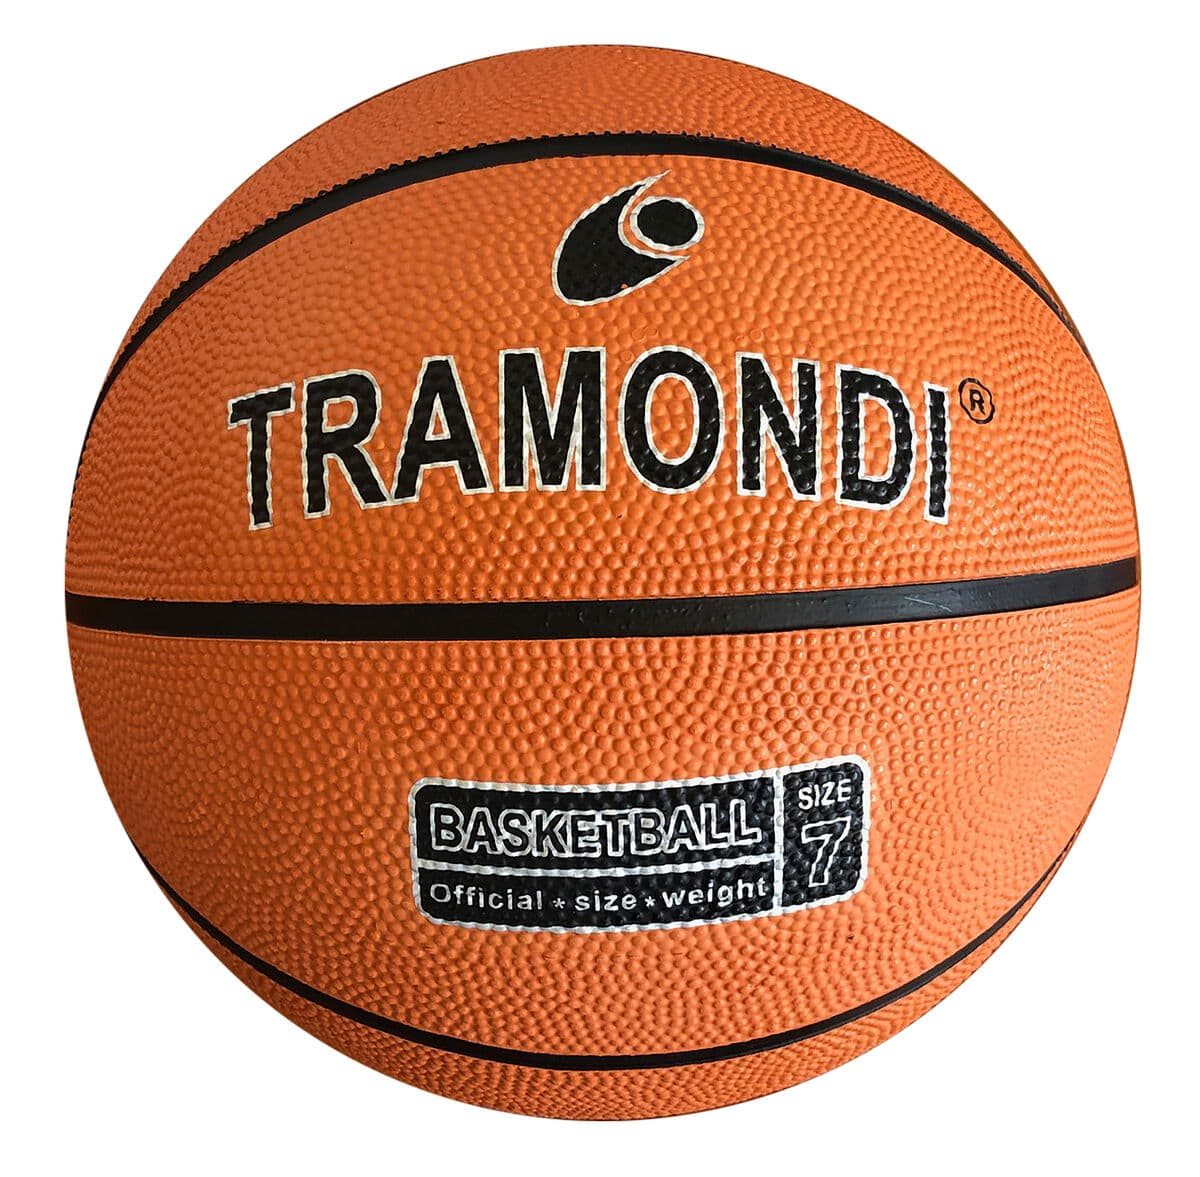 Tramondi Basketball Nr.7 Ball